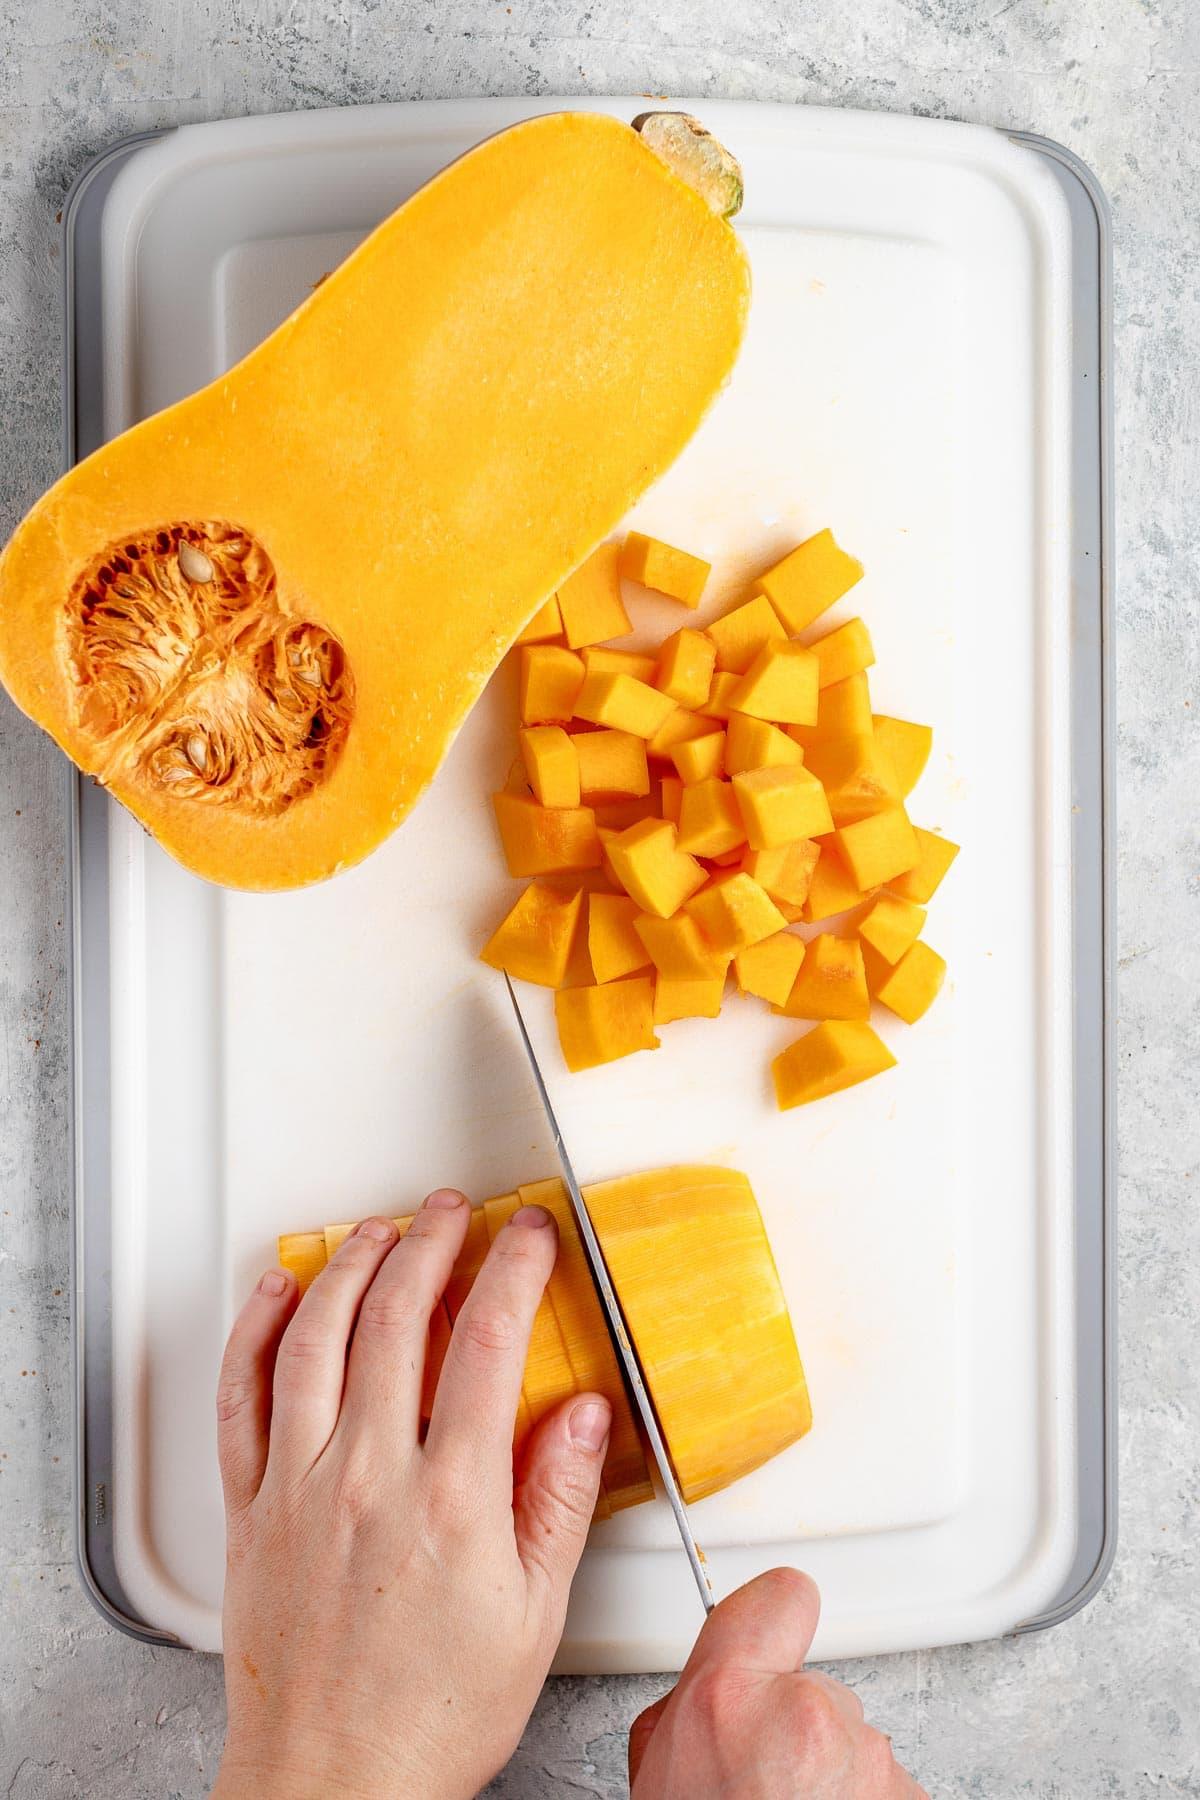 how to cut butternut squash